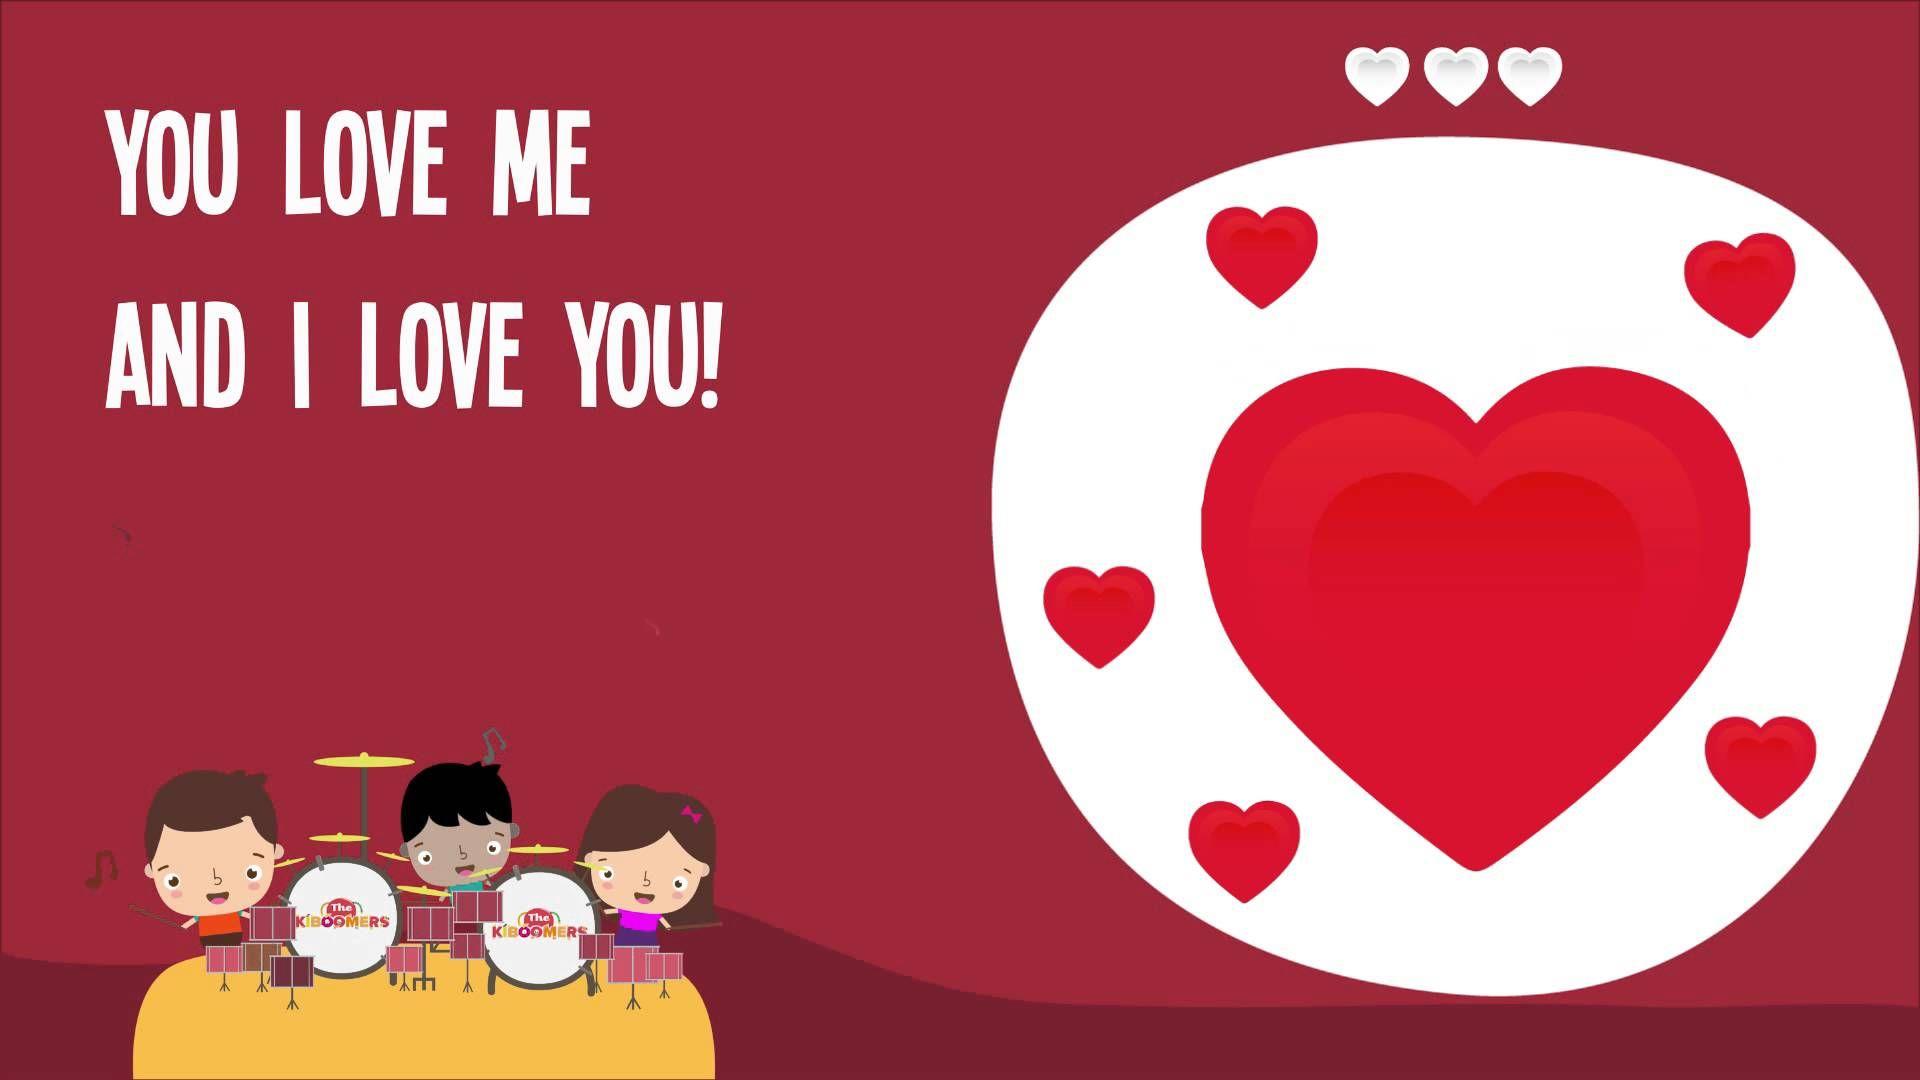 I Love You Song for Kids | I Love You Song Lyrics | Nursery